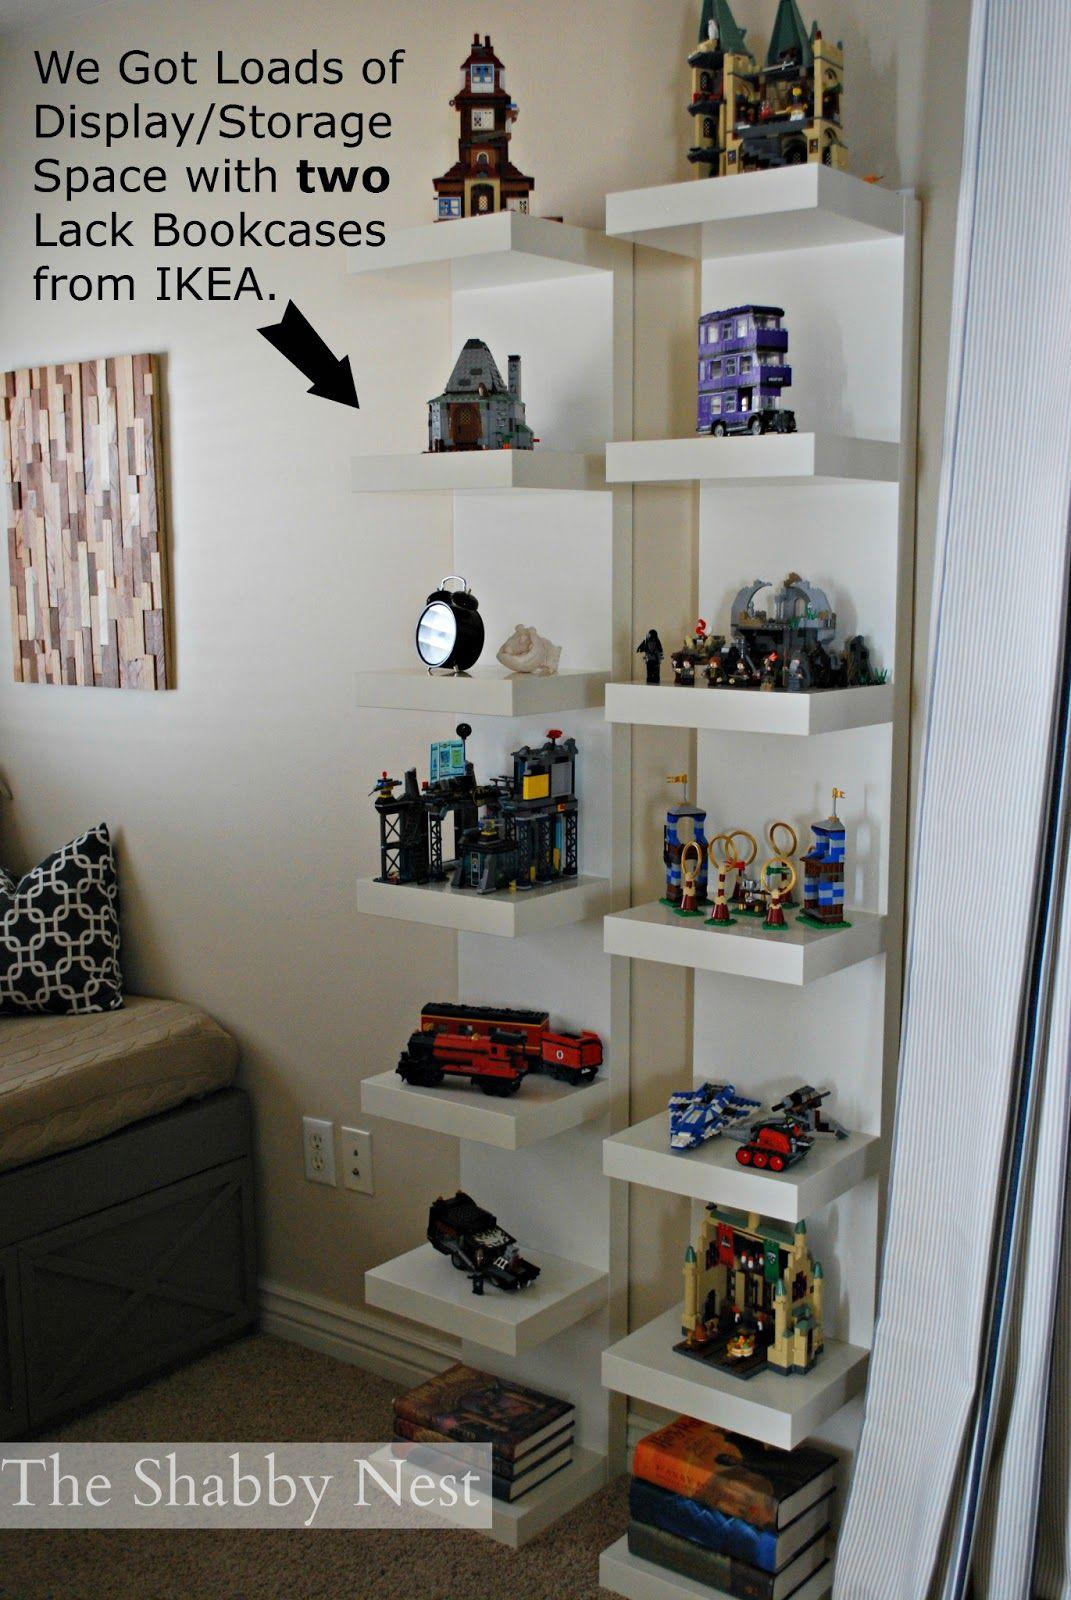 Ikea Boys Lego Bedroom Ideas We Used Lack Bookcases To